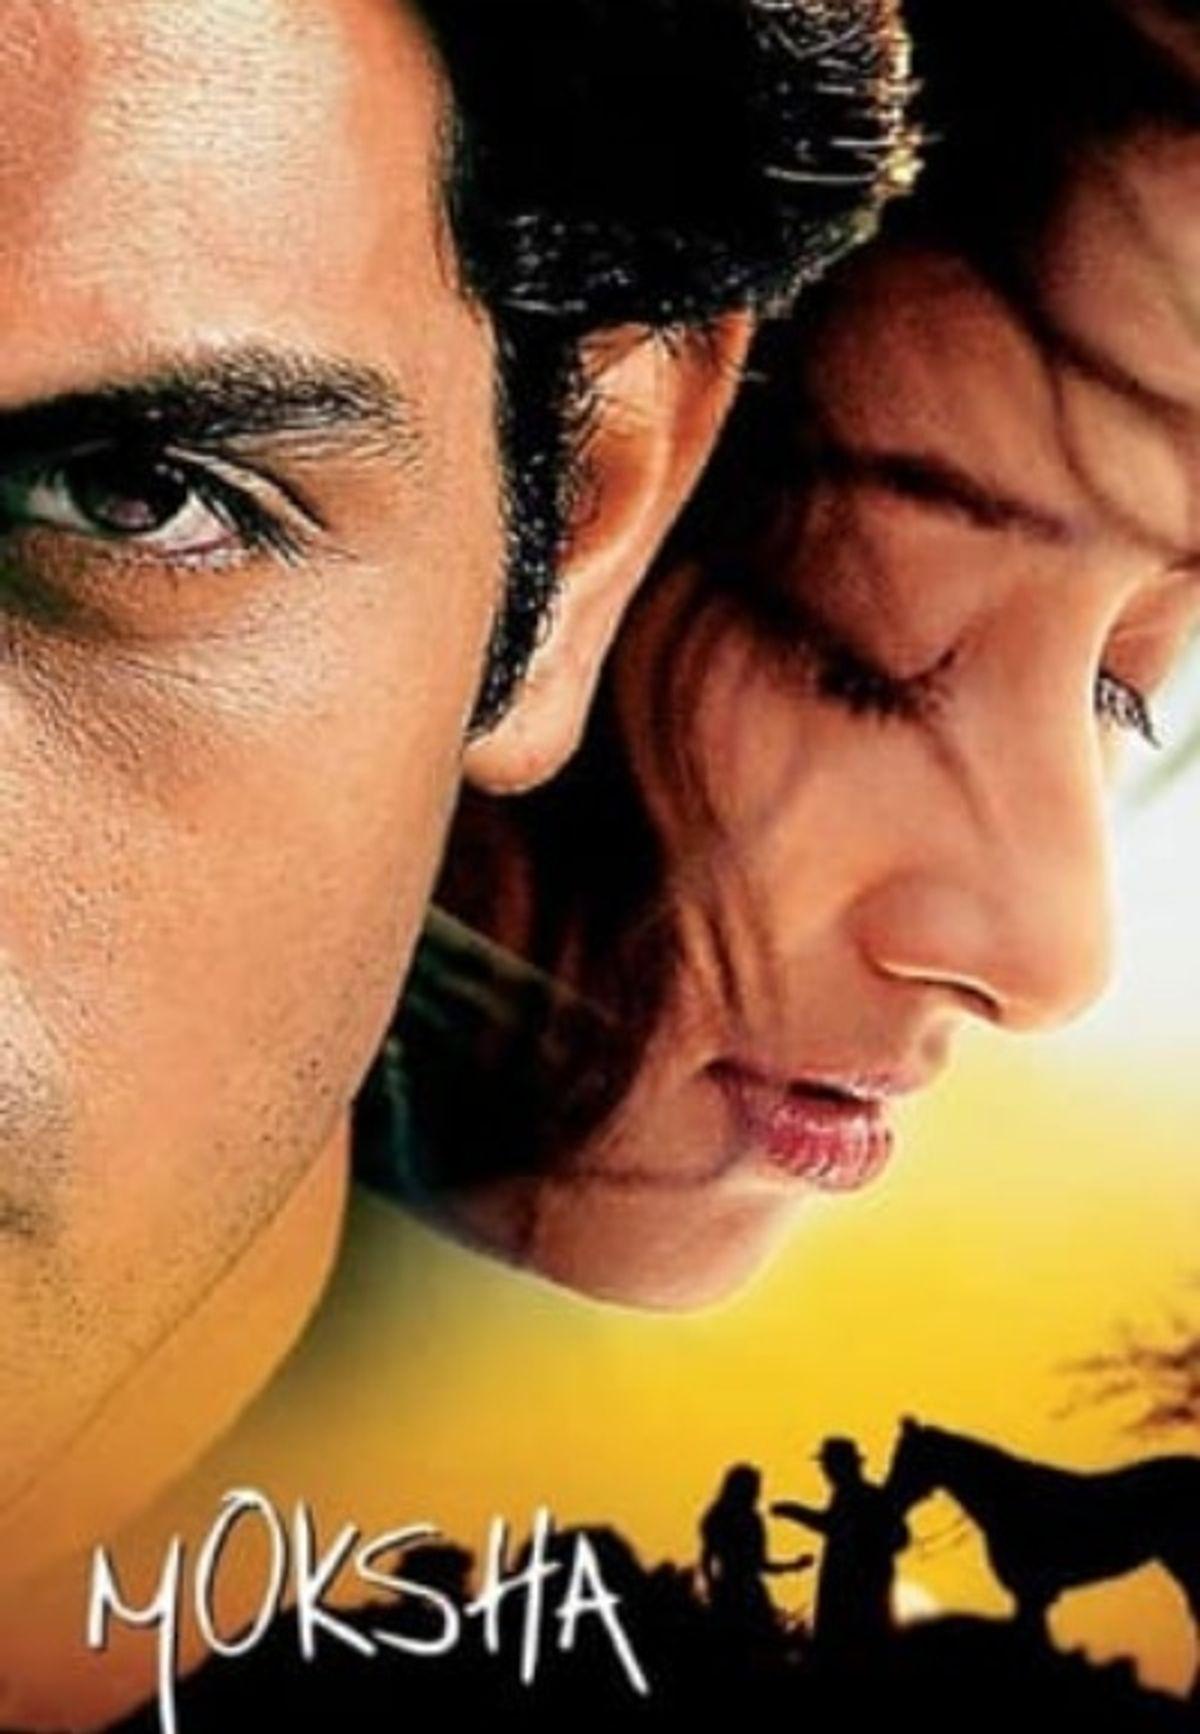 Arjun Rampal Best Movies, TV Shows and Web Series List